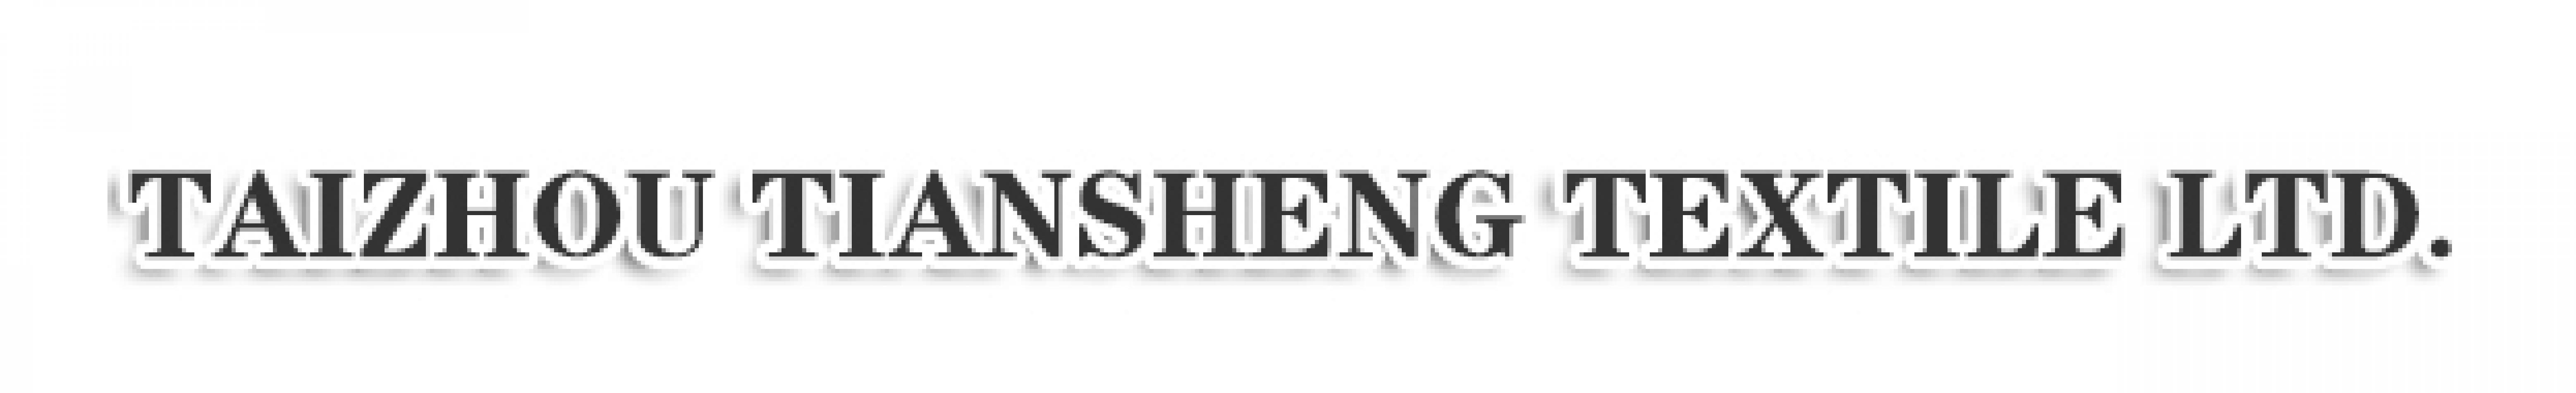 TAIZHOU SPEED TEXTILE TECHNOLOGY CO.,LTD